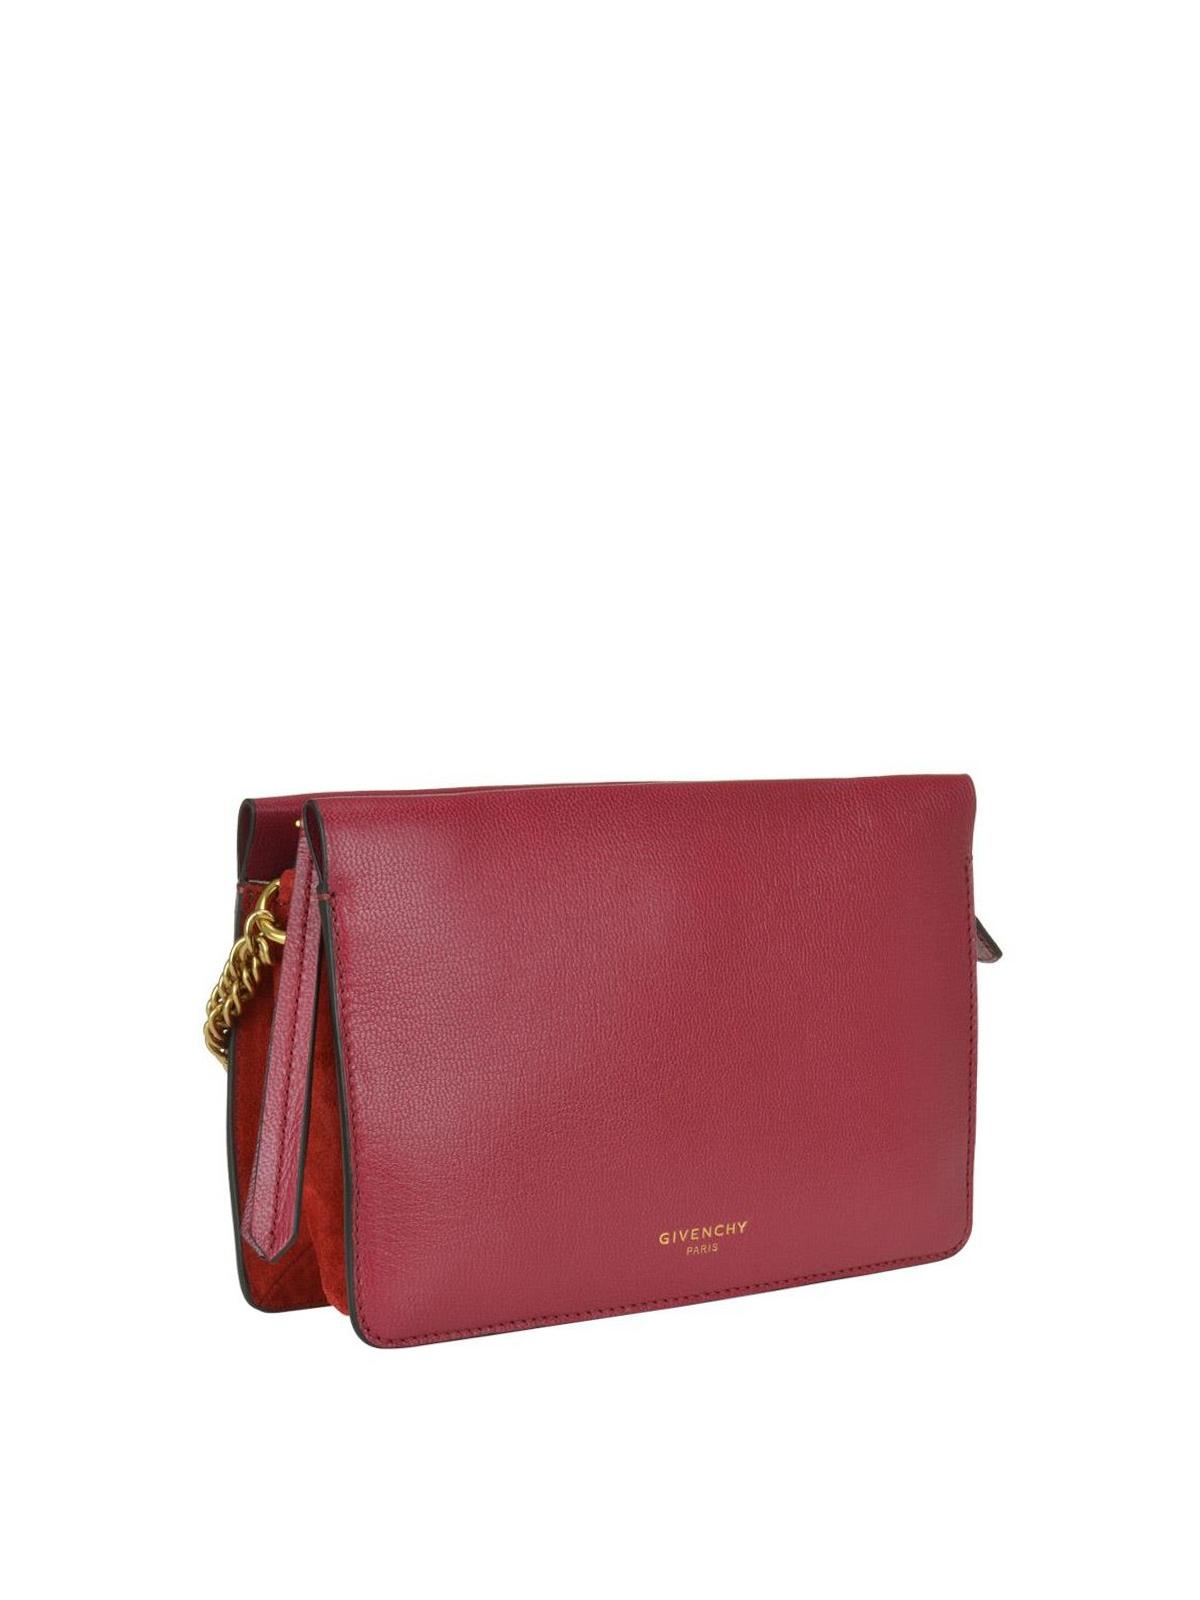 70912b16c68b GIVENCHY  cross body bags online - Cross 3 burgundy leather zipped small bag